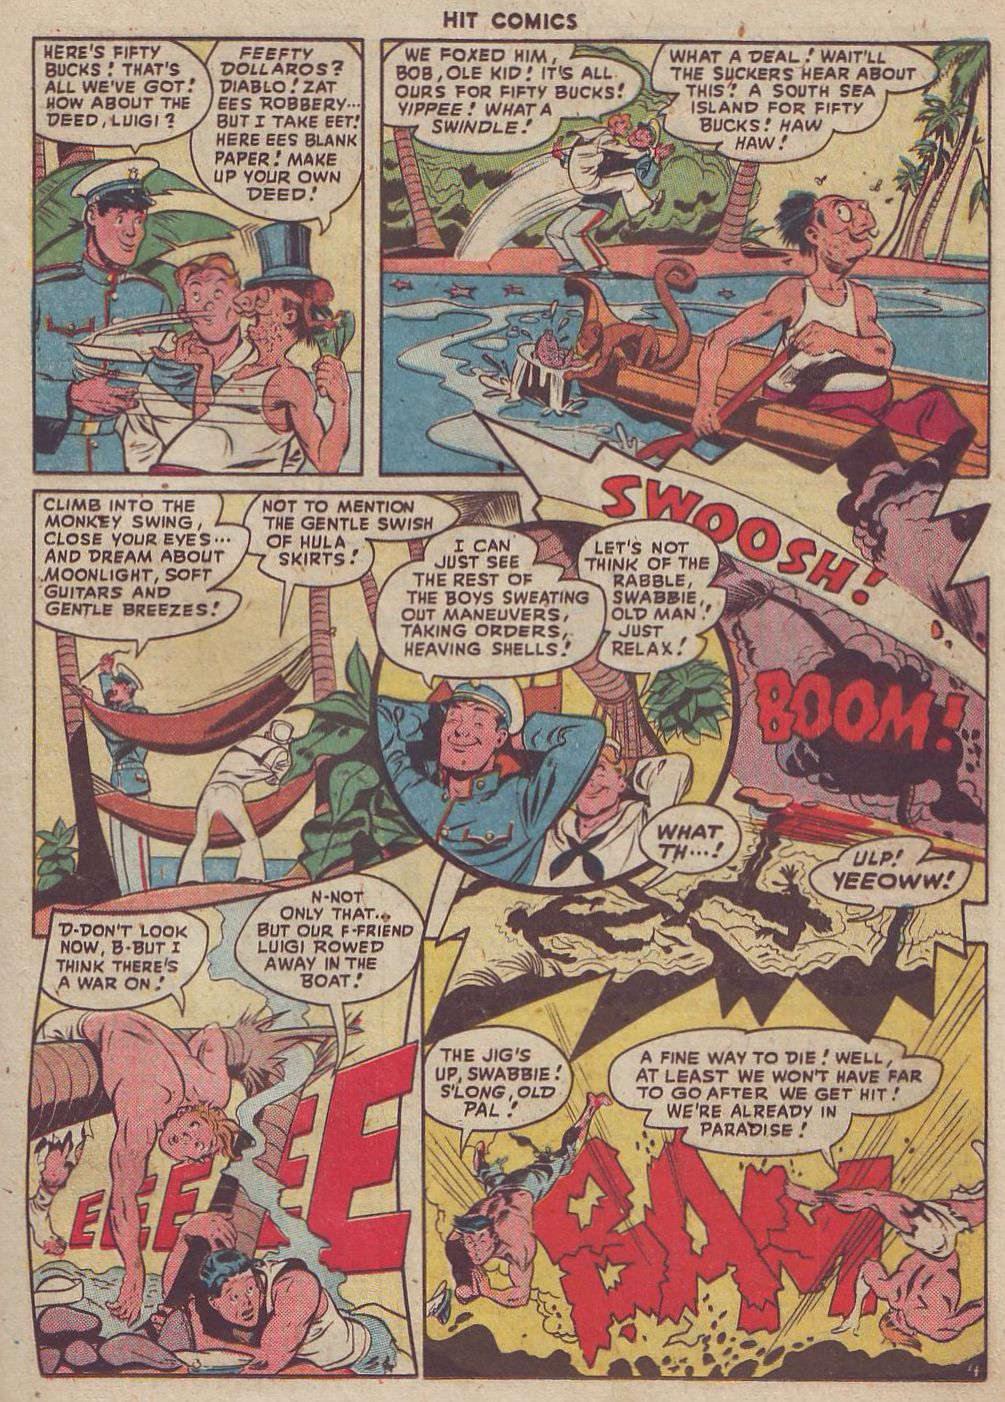 Read online Hit Comics comic -  Issue #51 - 19